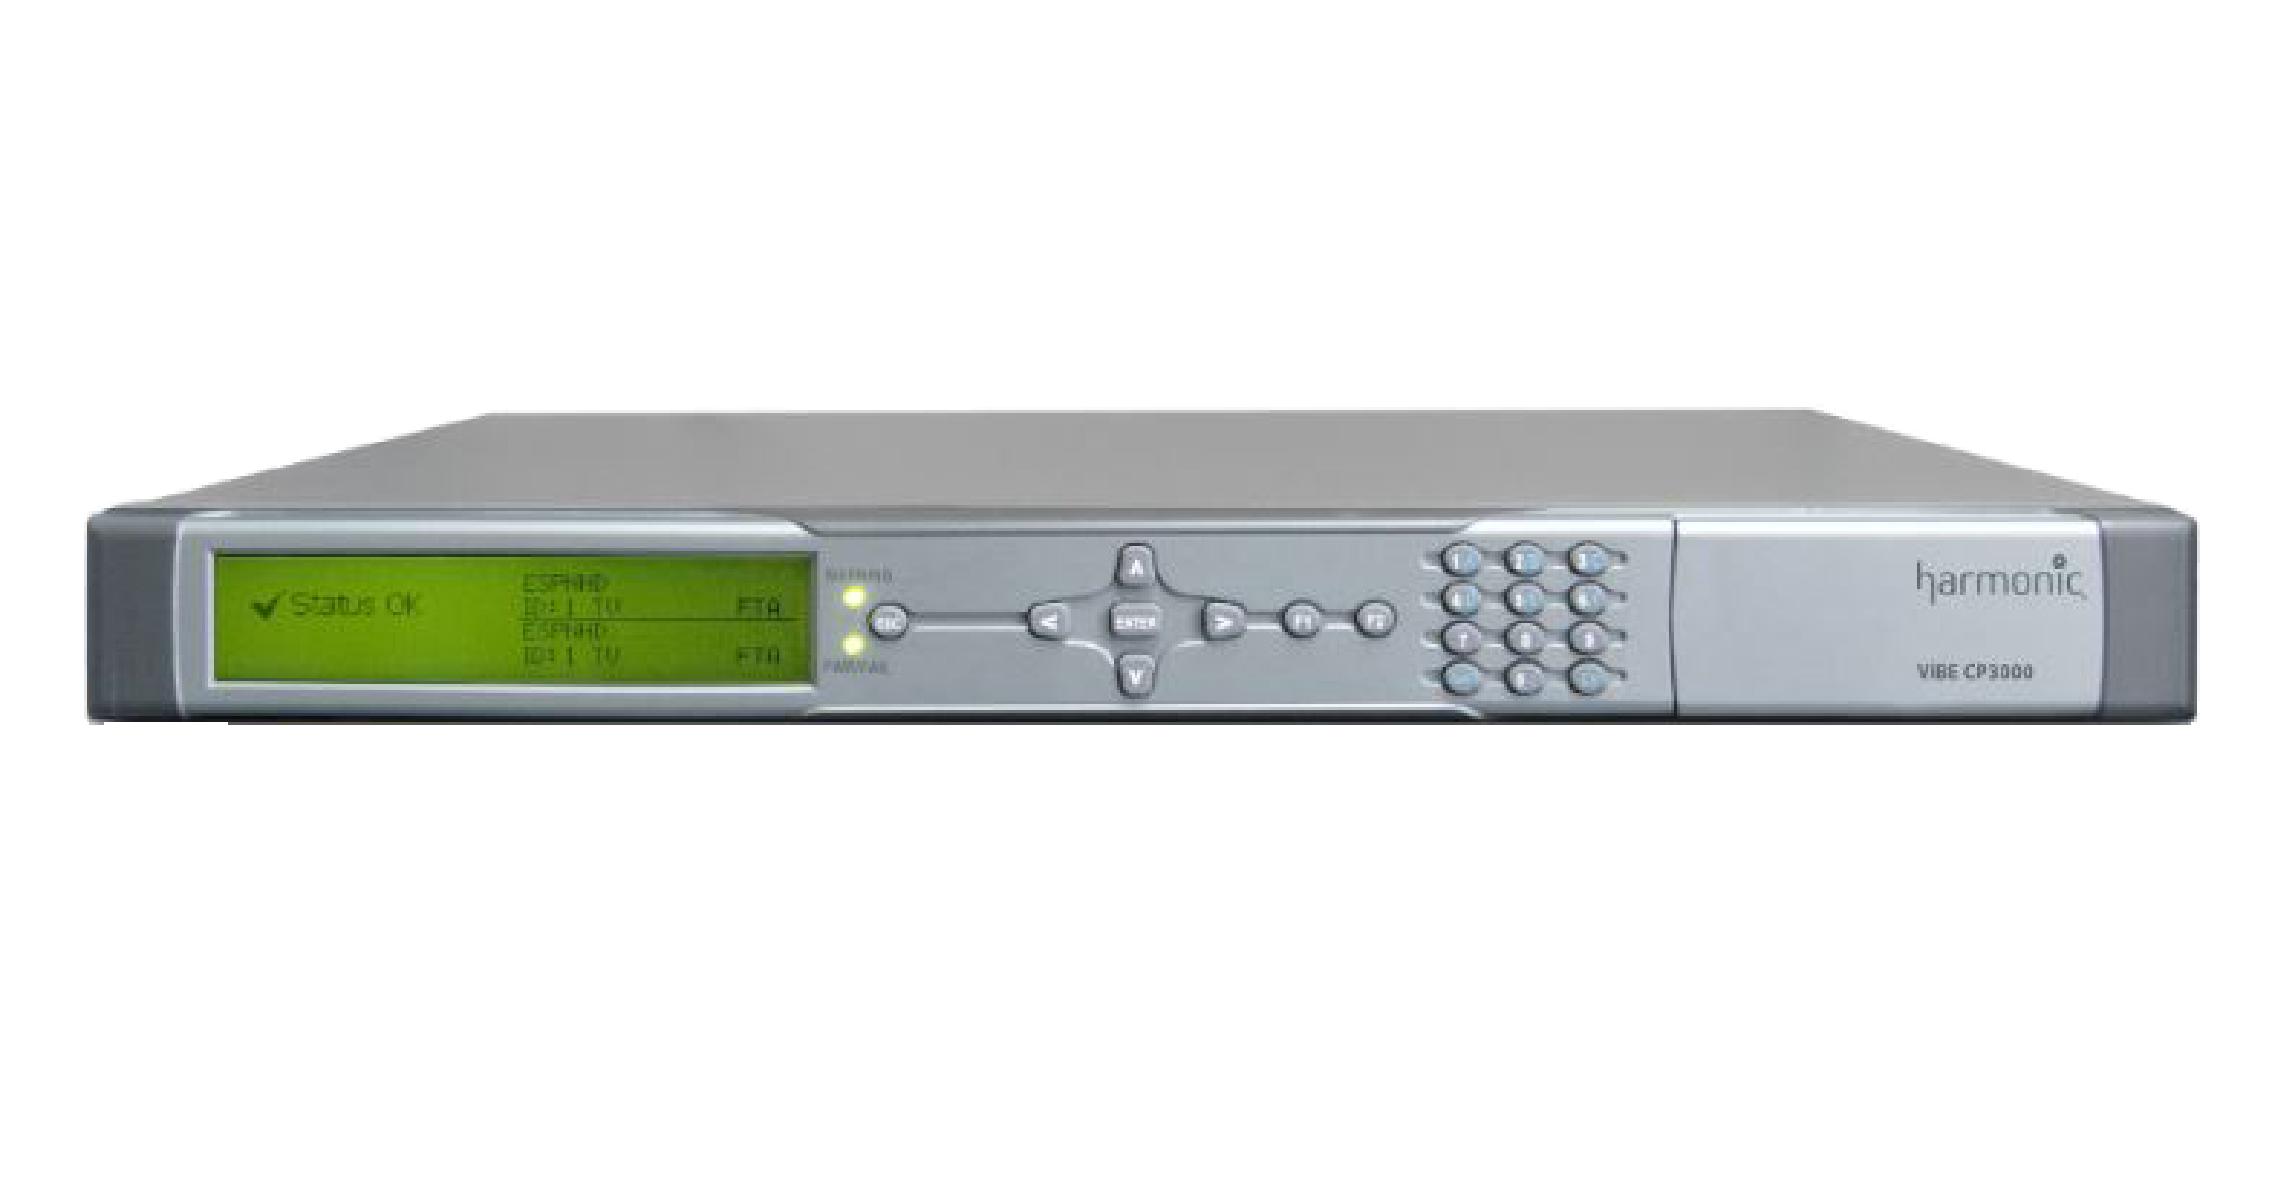 ViBE CP3000 Encoder